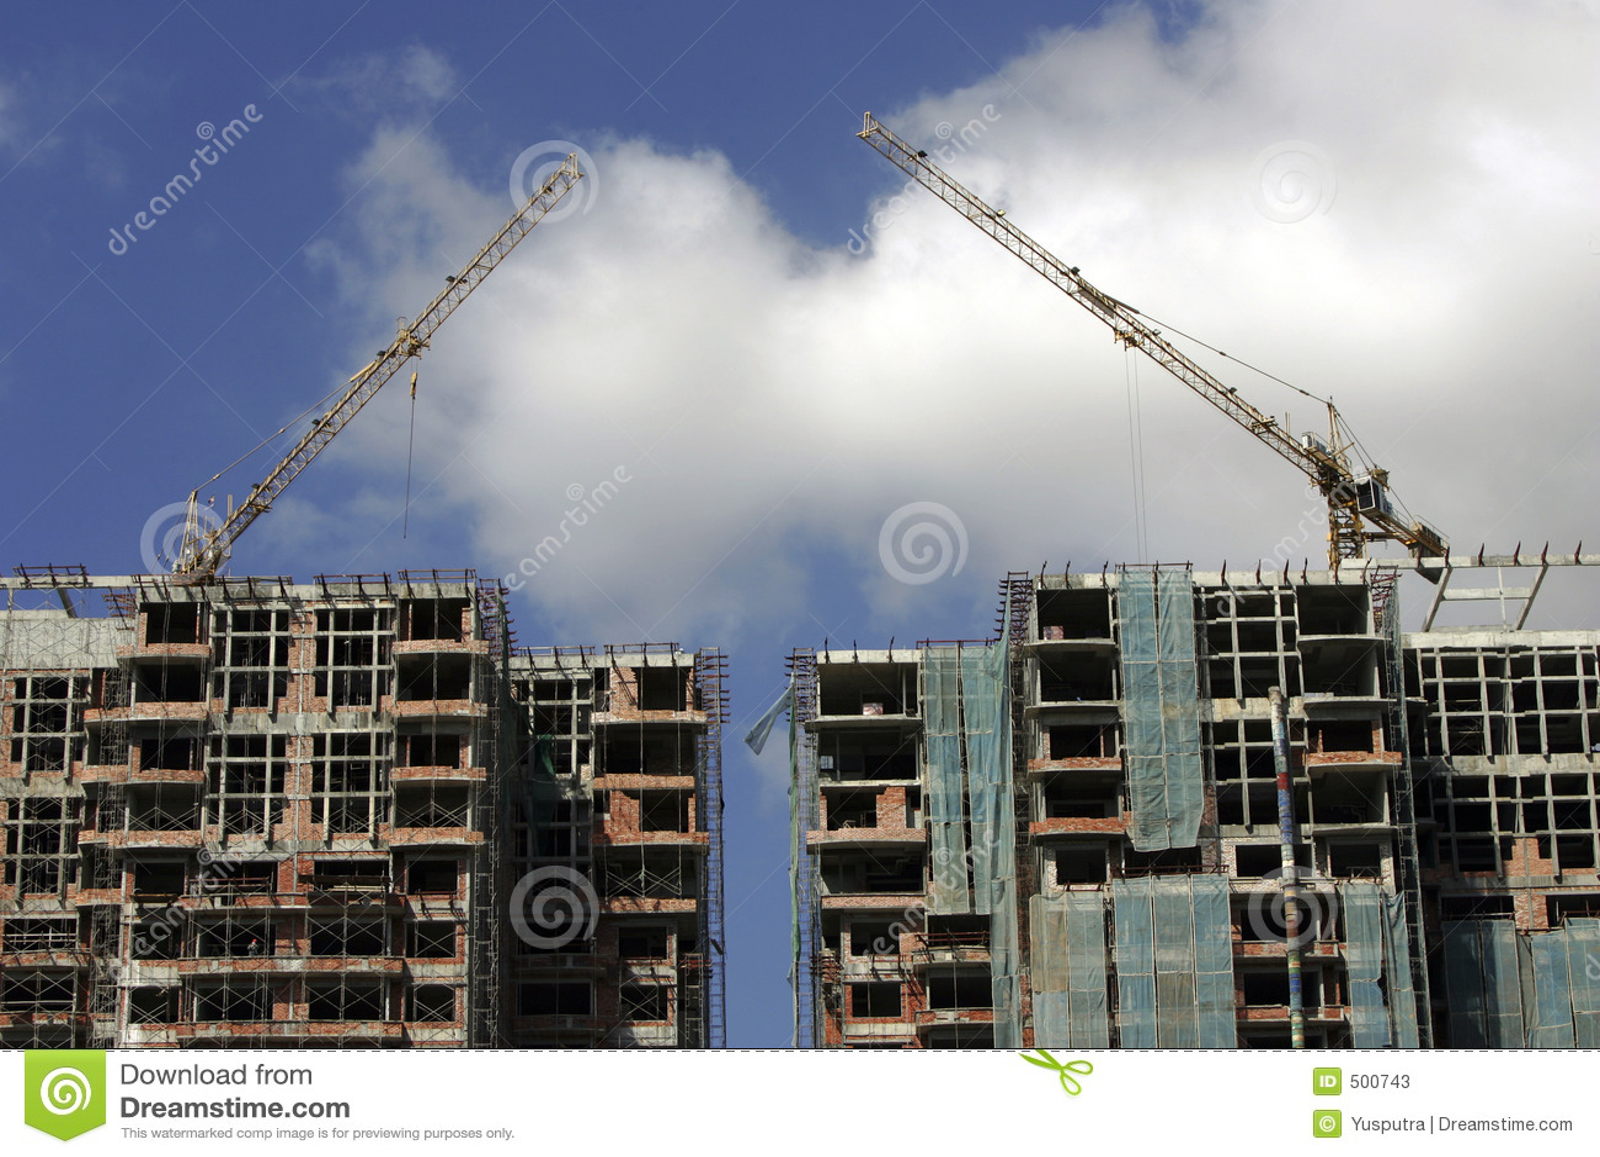 Building under construction stock photos image 500743 for Building under construction insurance